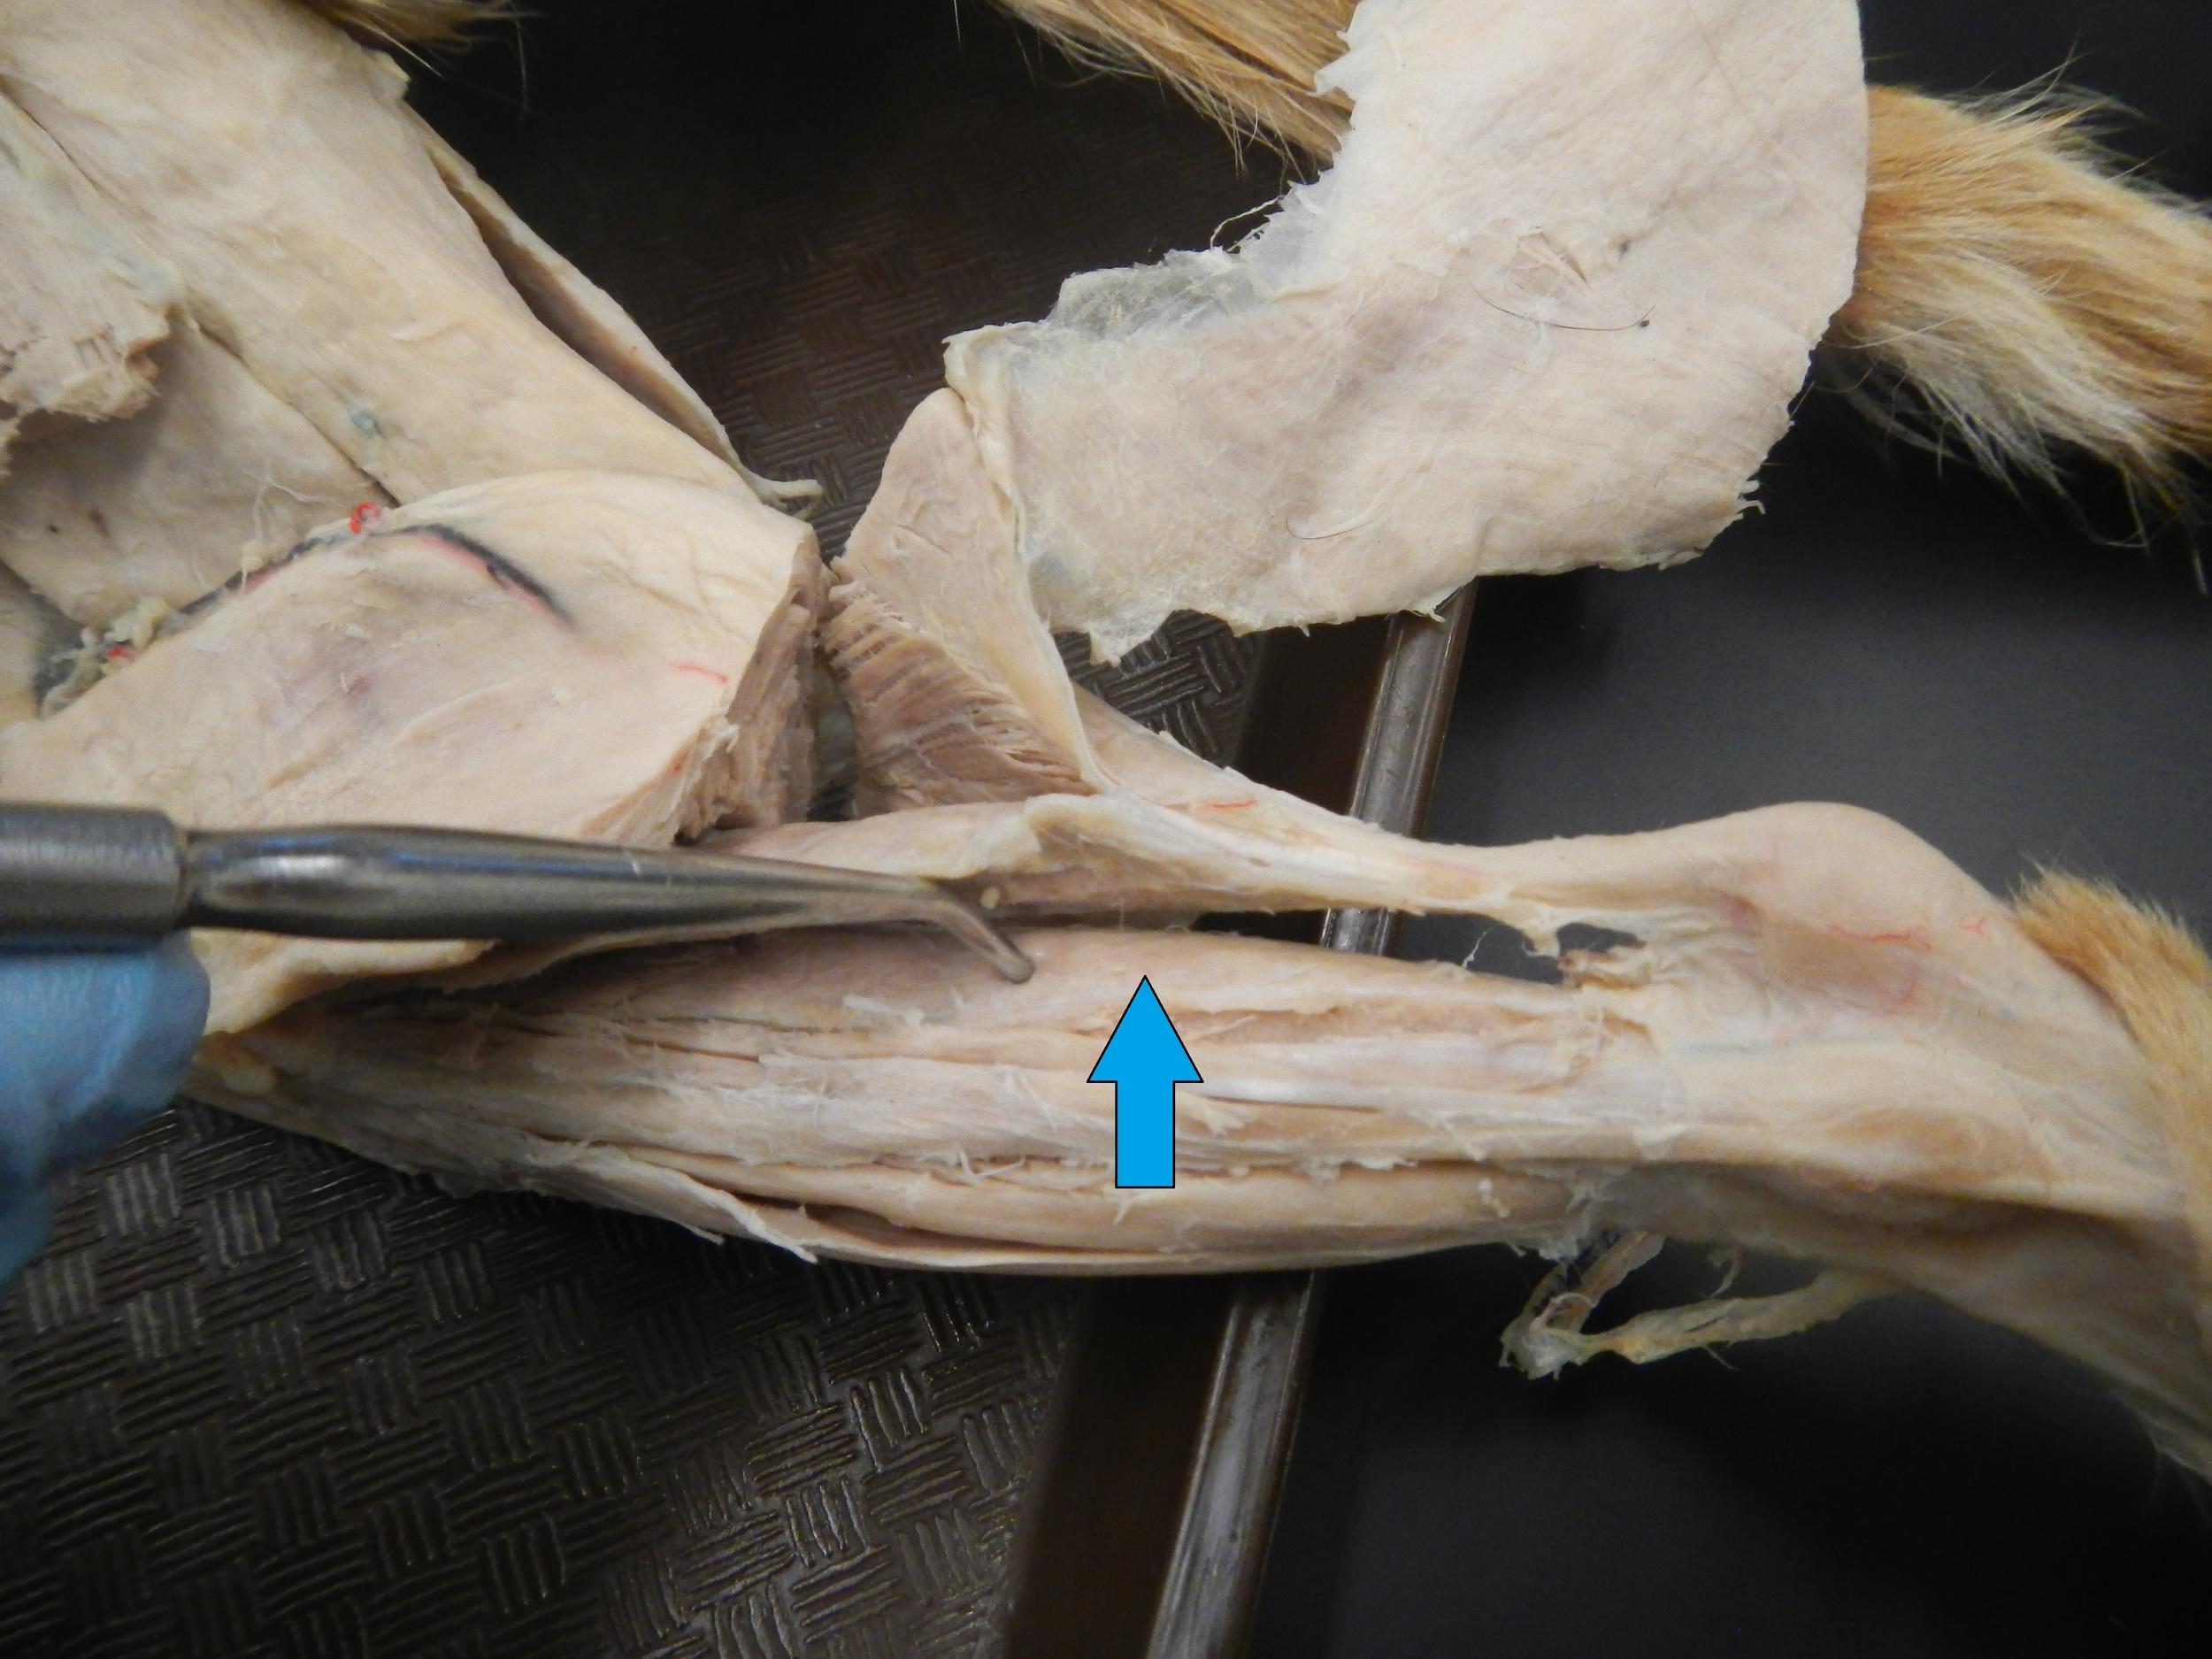 Flexor Hallucis Longus - Lateral View